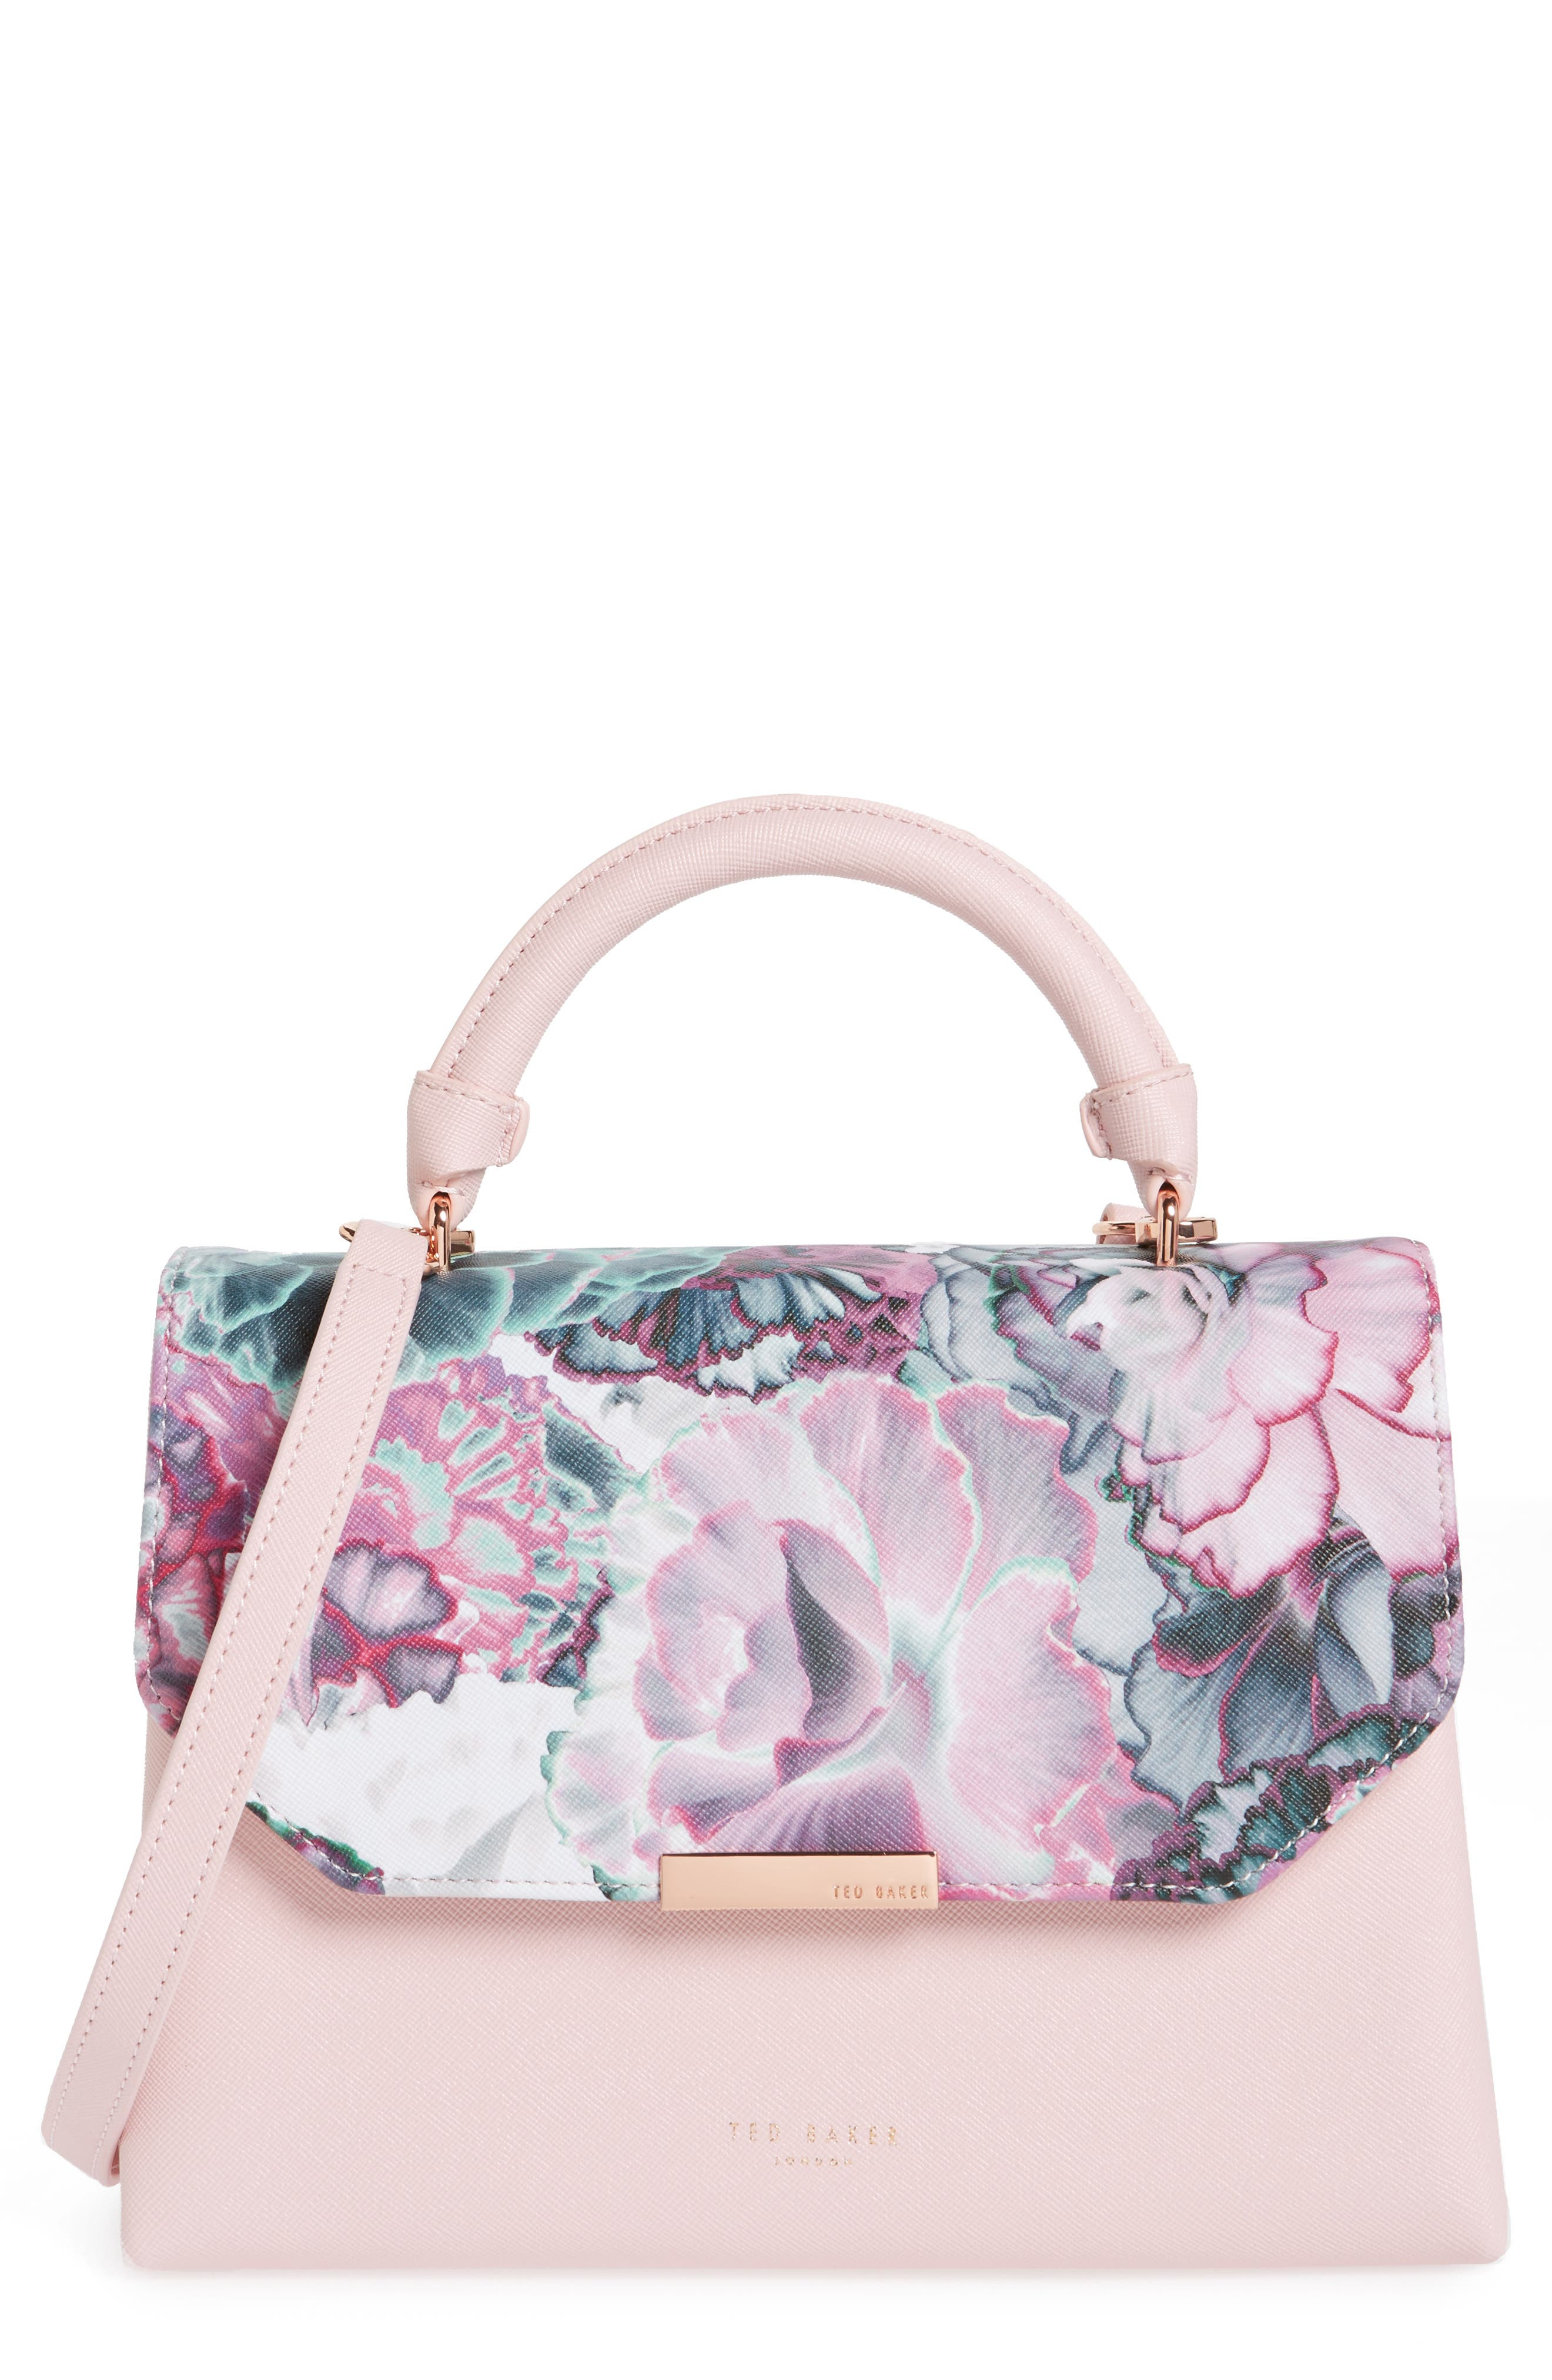 Main Image - Ted Baker London Illuminated Bloom Crossbody Bag